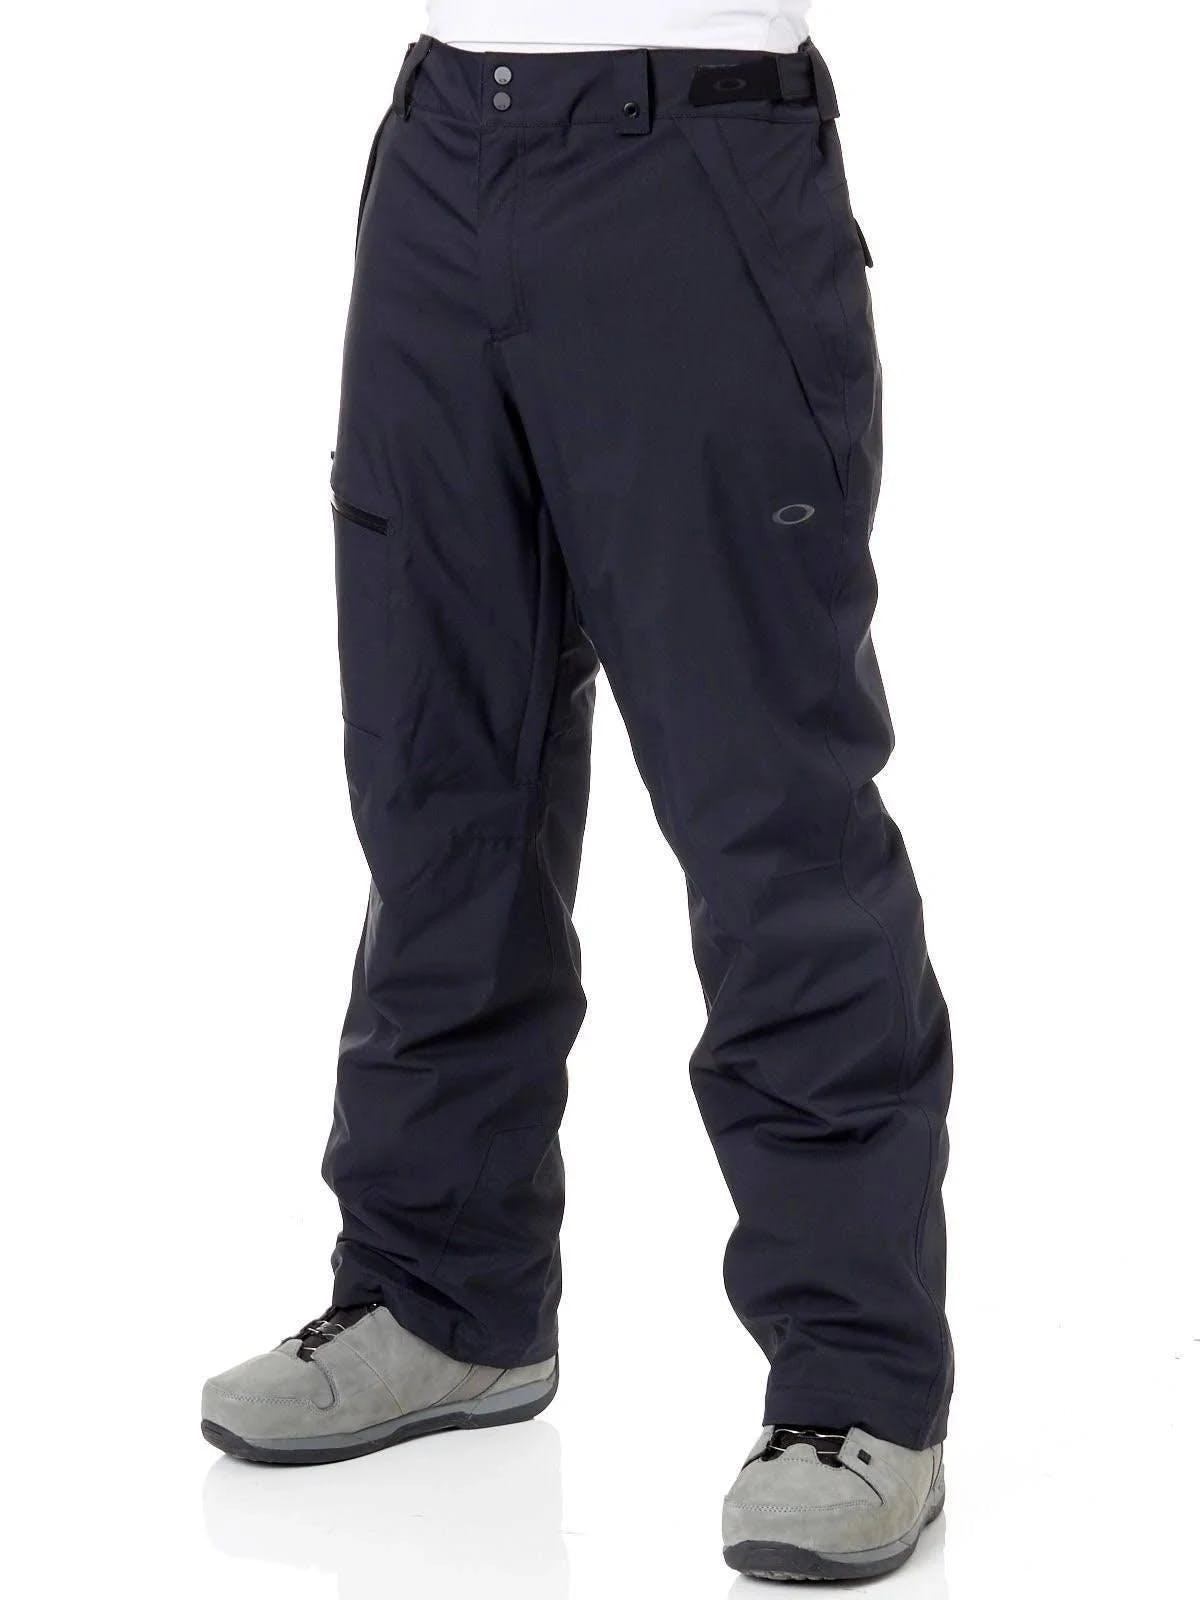 Oakley Men's Ski Insulated 10K/2L Pant Large Blackout